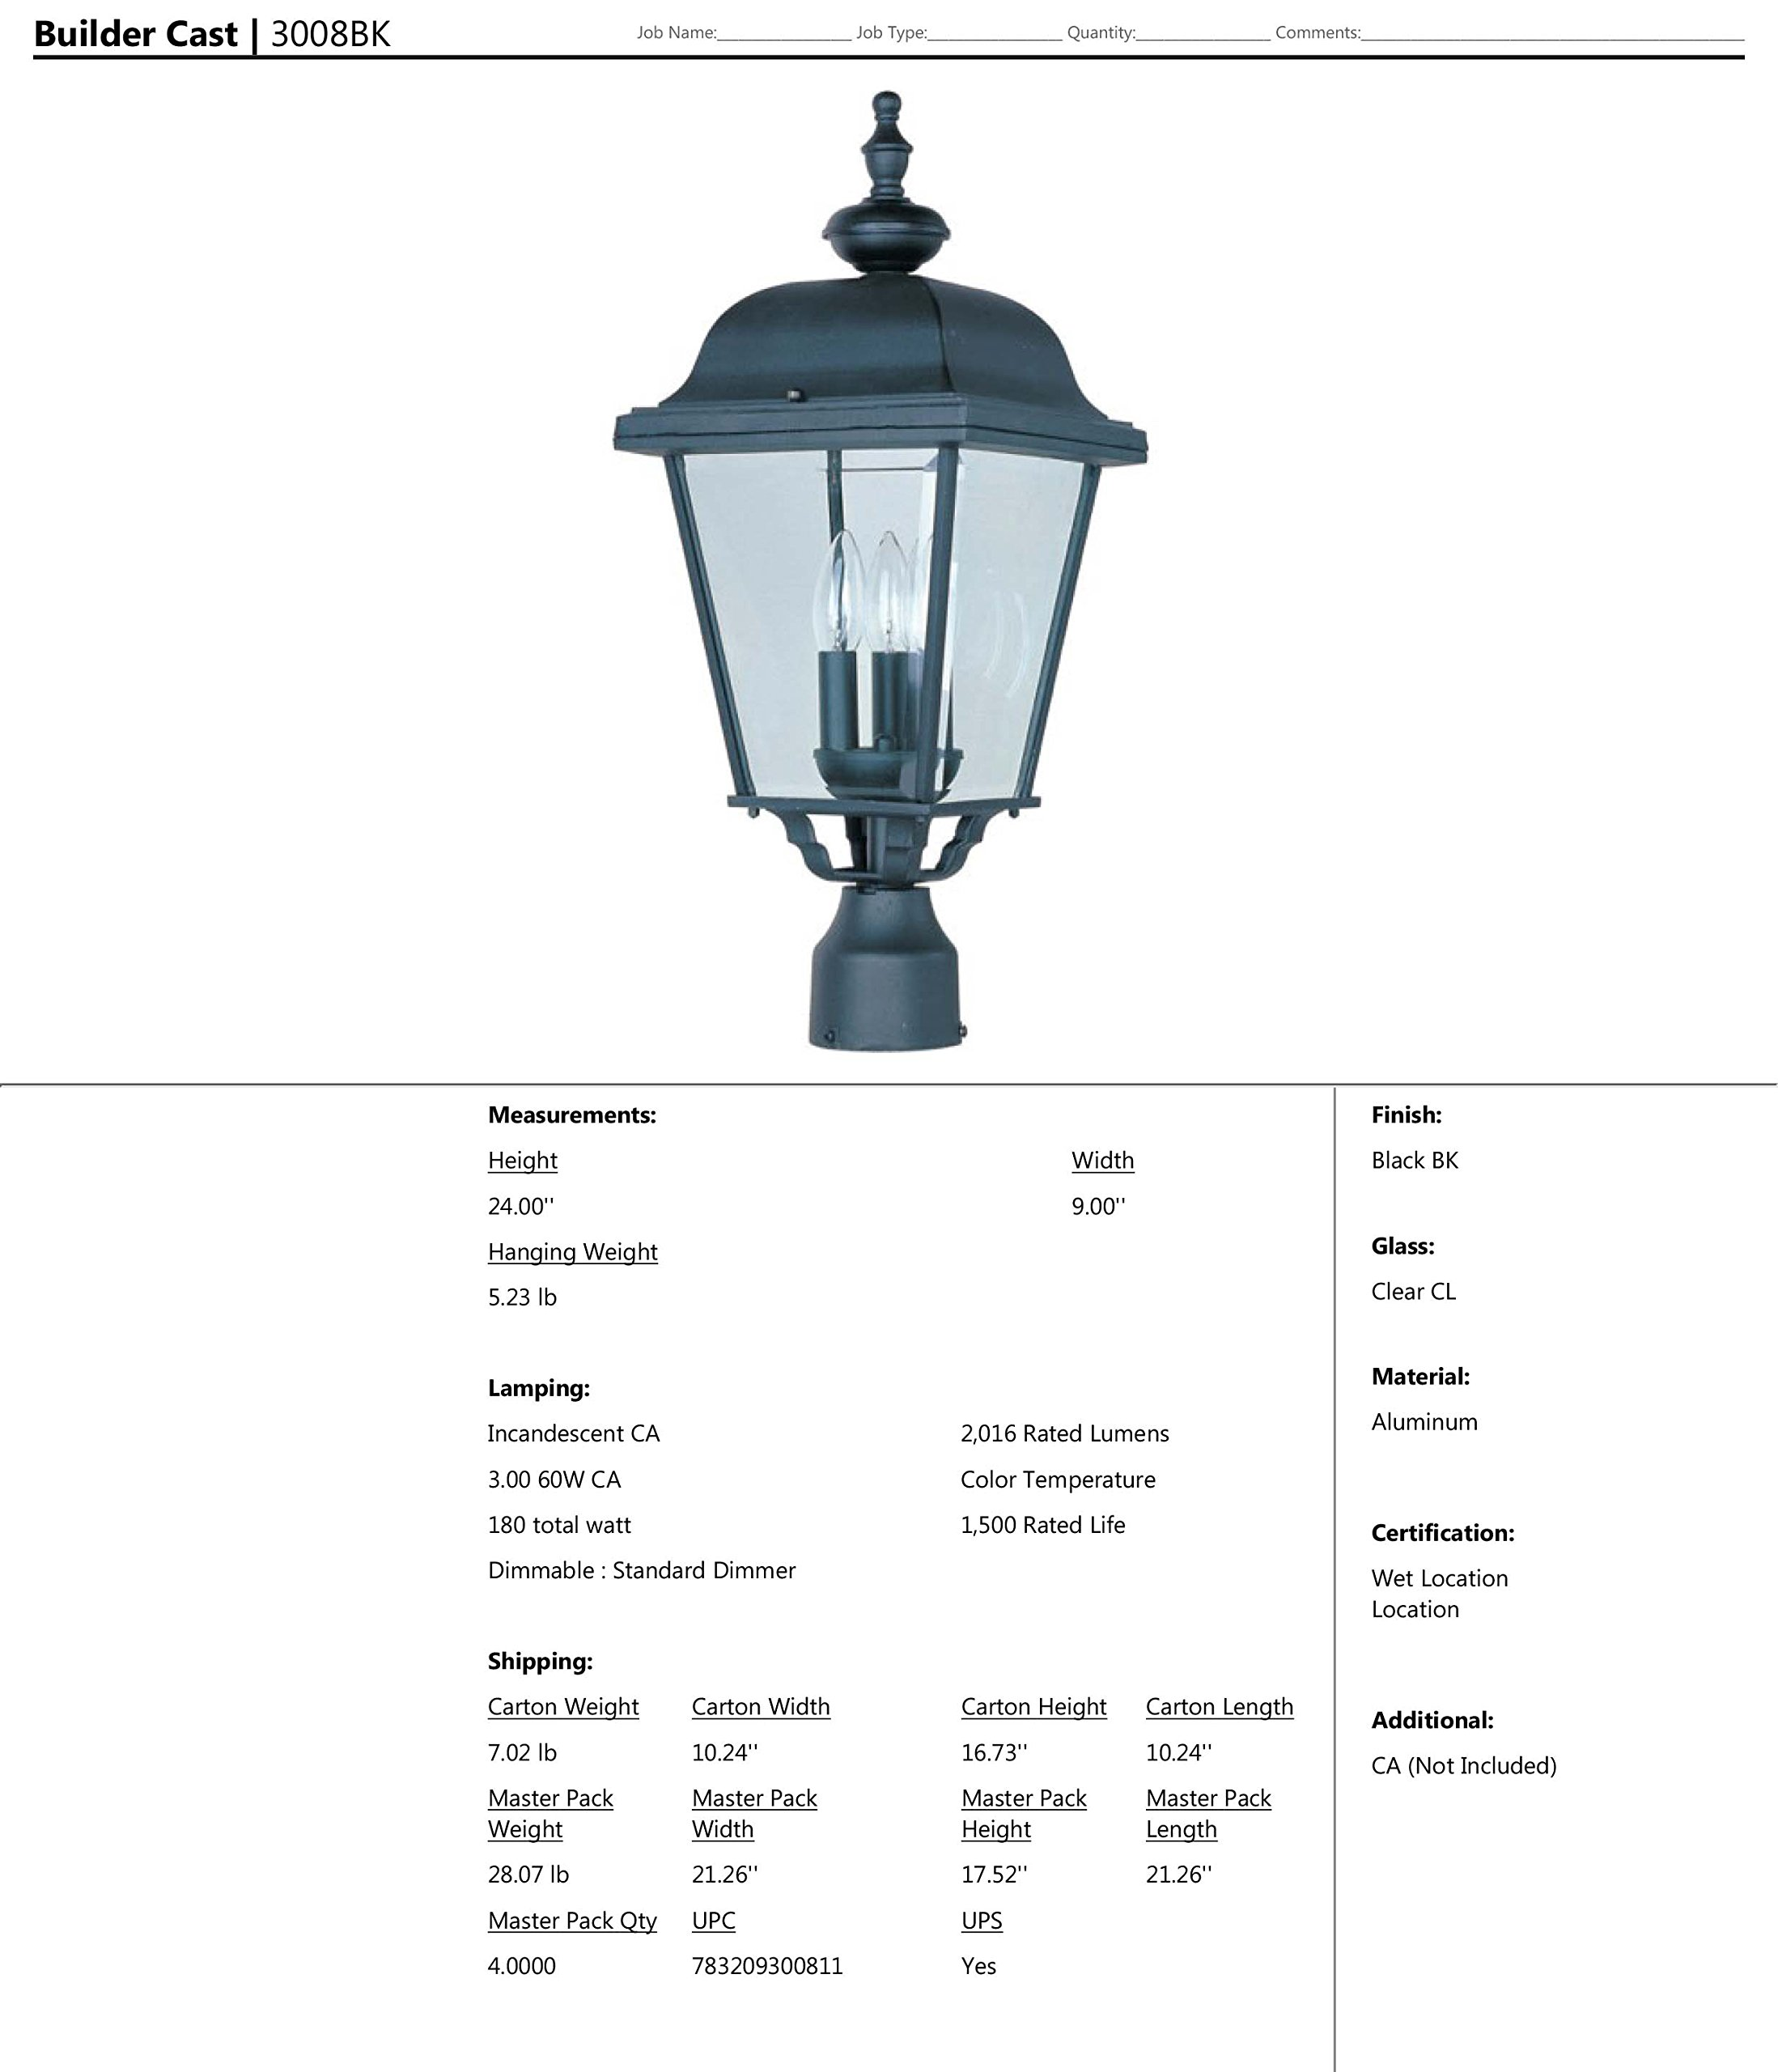 Maxim 3008BK Builder Cast Aluminum Outdoor Post Lighting 9 by 24 Inch – Outdoor Light Fixtures for Lobby, Courtyard, Balcony, Dockyard. Lighting Accessory by Maxim Lighting (Image #2)